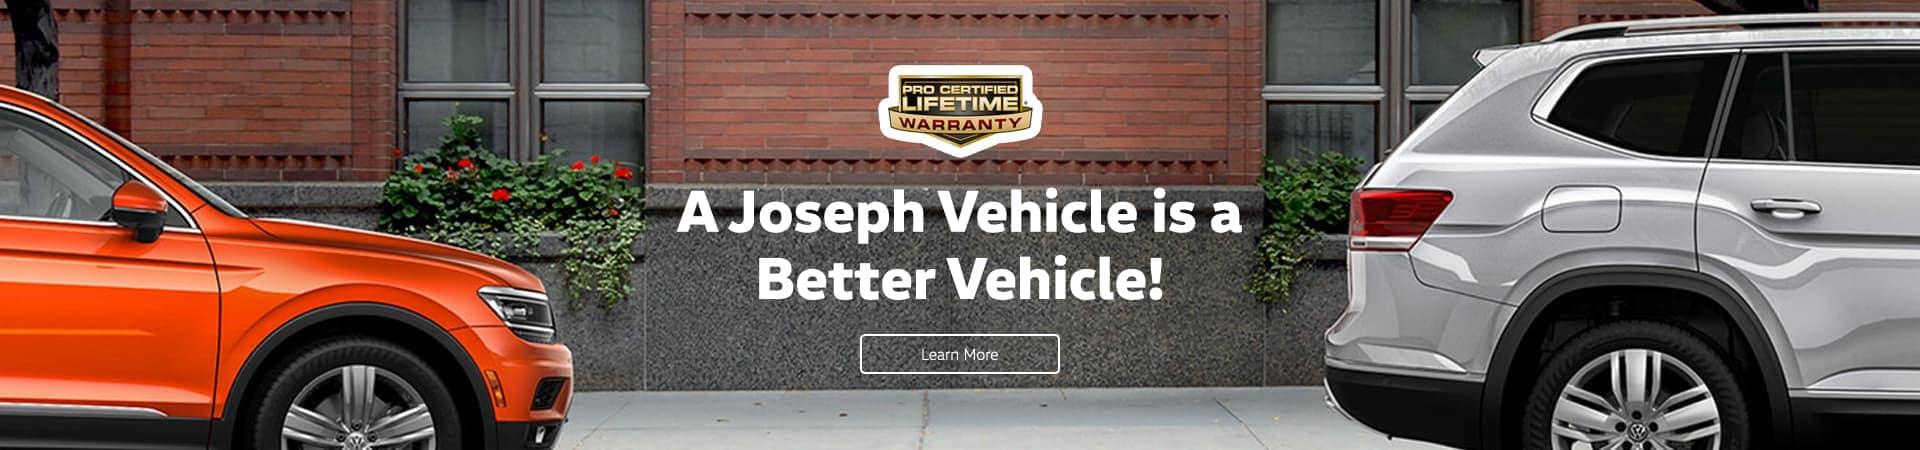 A Joseph Vehicle Is A Better Vehicle   Joseph Volkswagen of Cincinnati   Cincinnati, OH